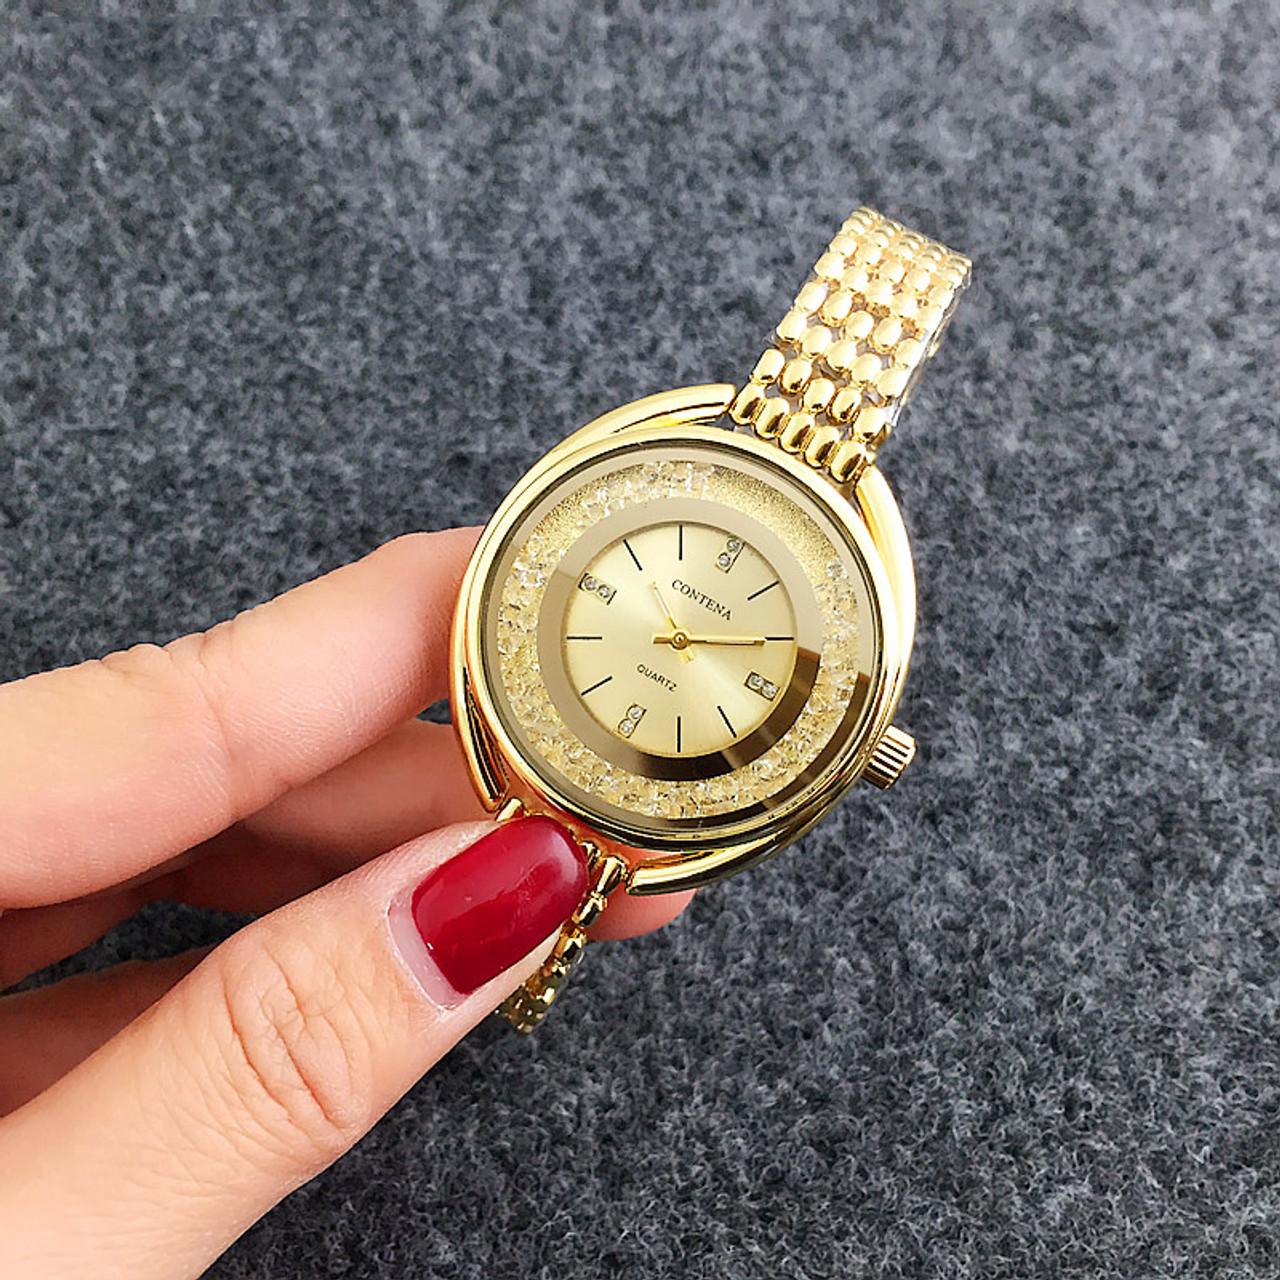 fdec38d7e6 Top Brand CONTENA Watch Women Watches Rose Gold Bracelet Watch Luxury  Rhinestone Ladies Watch saat montre femme relogio feminino